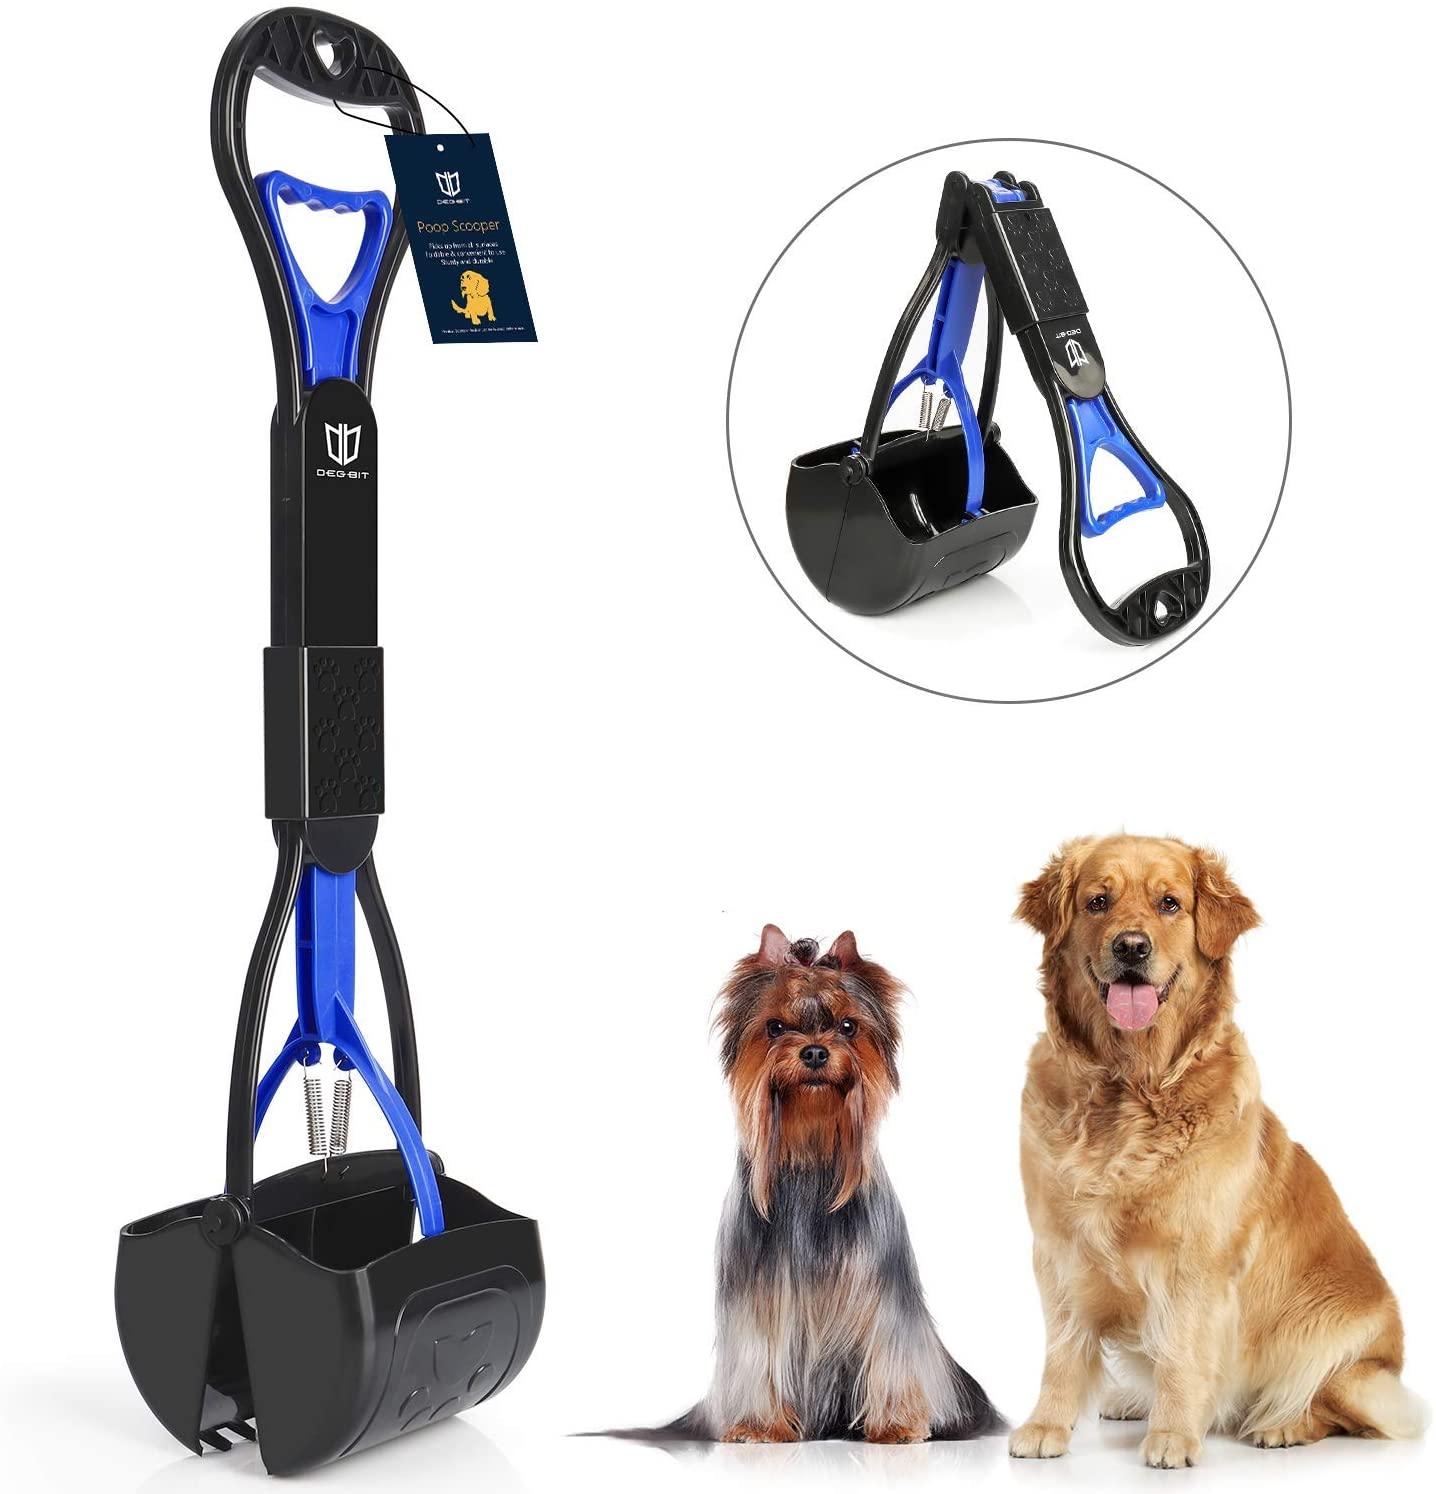 Long Handle Portable Pet Pooper Scooper $7.99